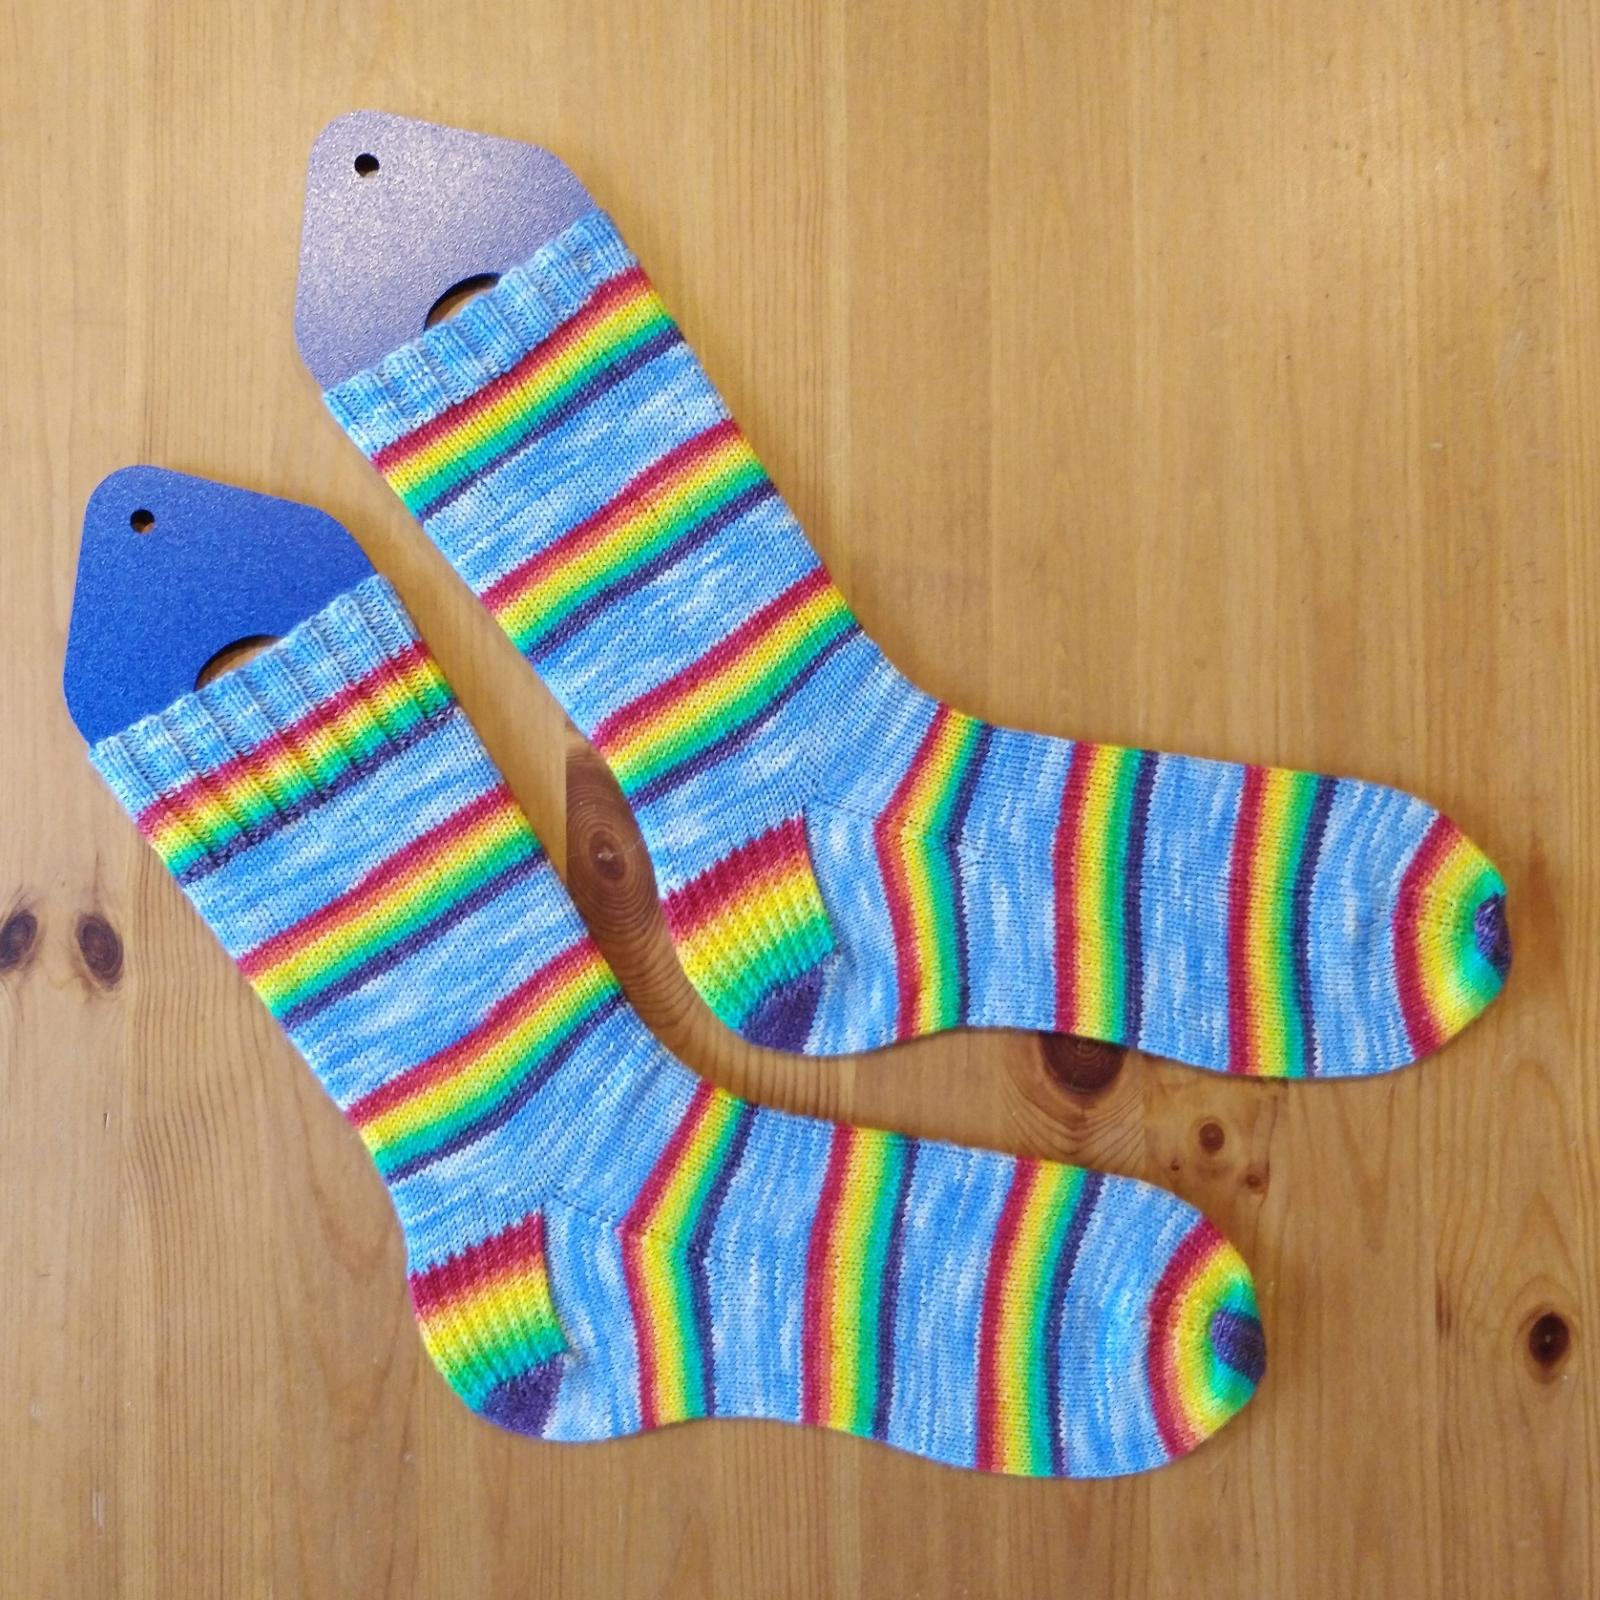 A pair of light blue socks with rainbow stripes.